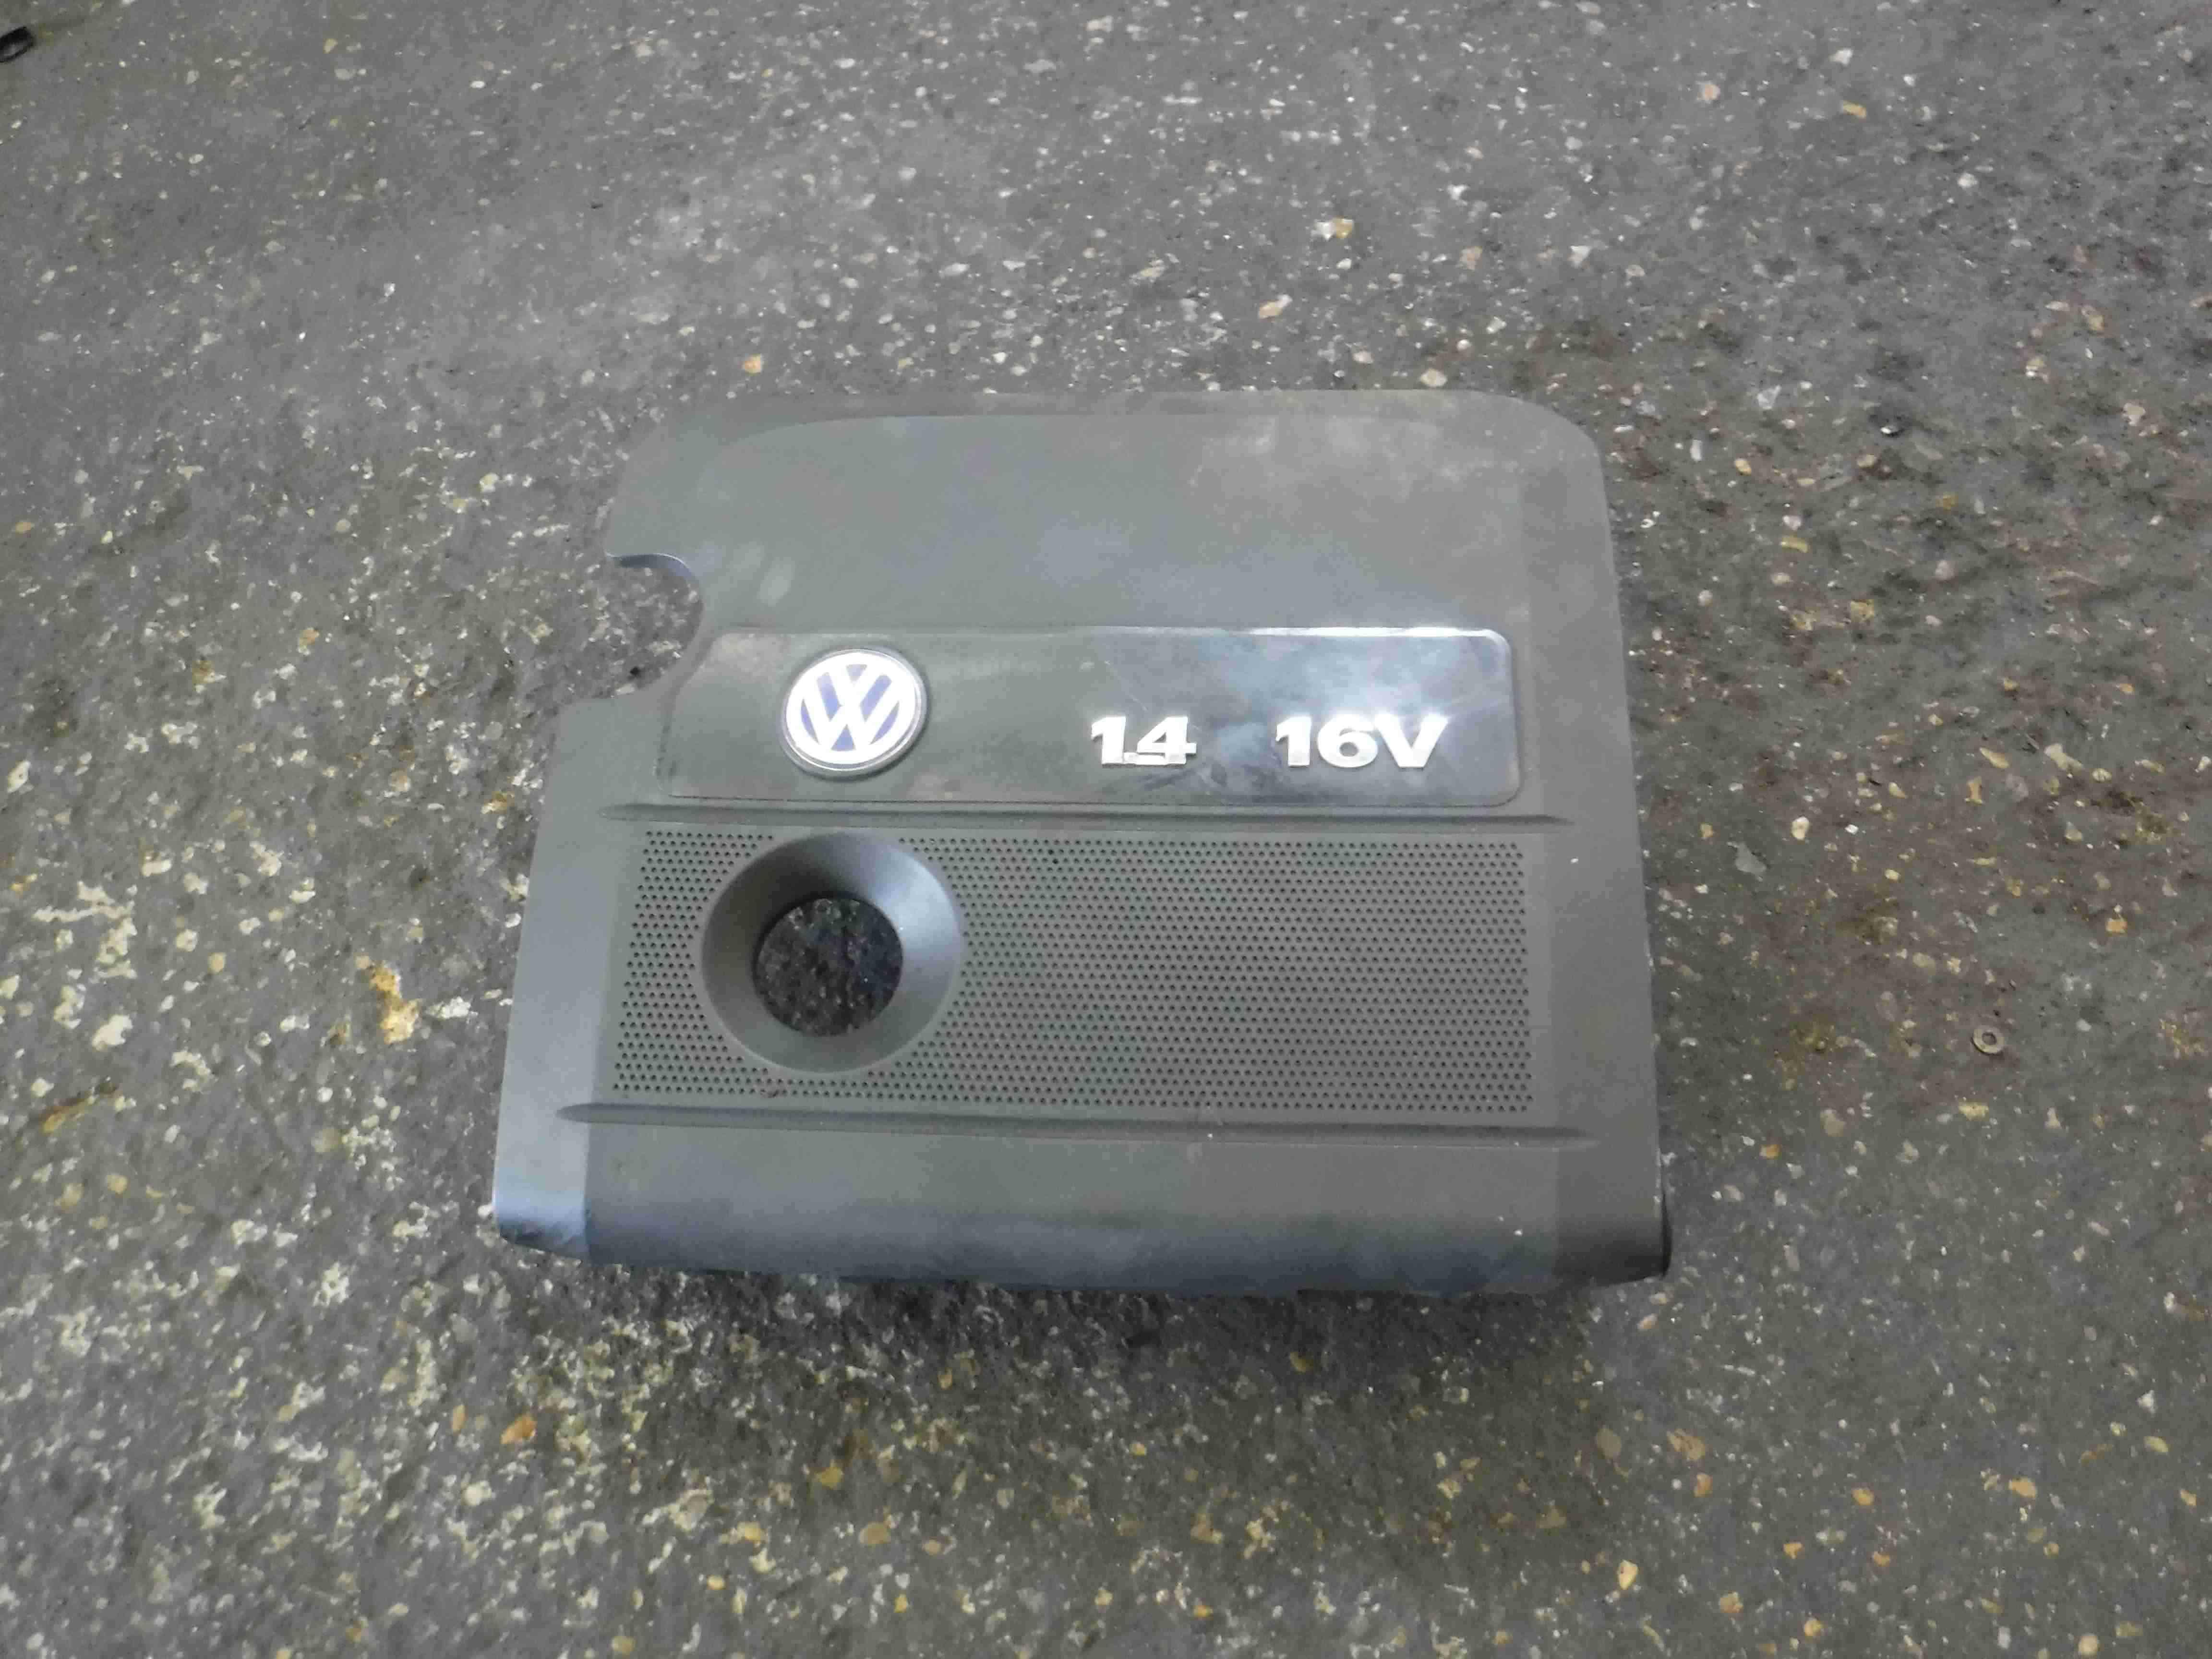 Volkswagen Polo 2003-2006 9N 1.4 16v Engine Cover Plastic 036129607T